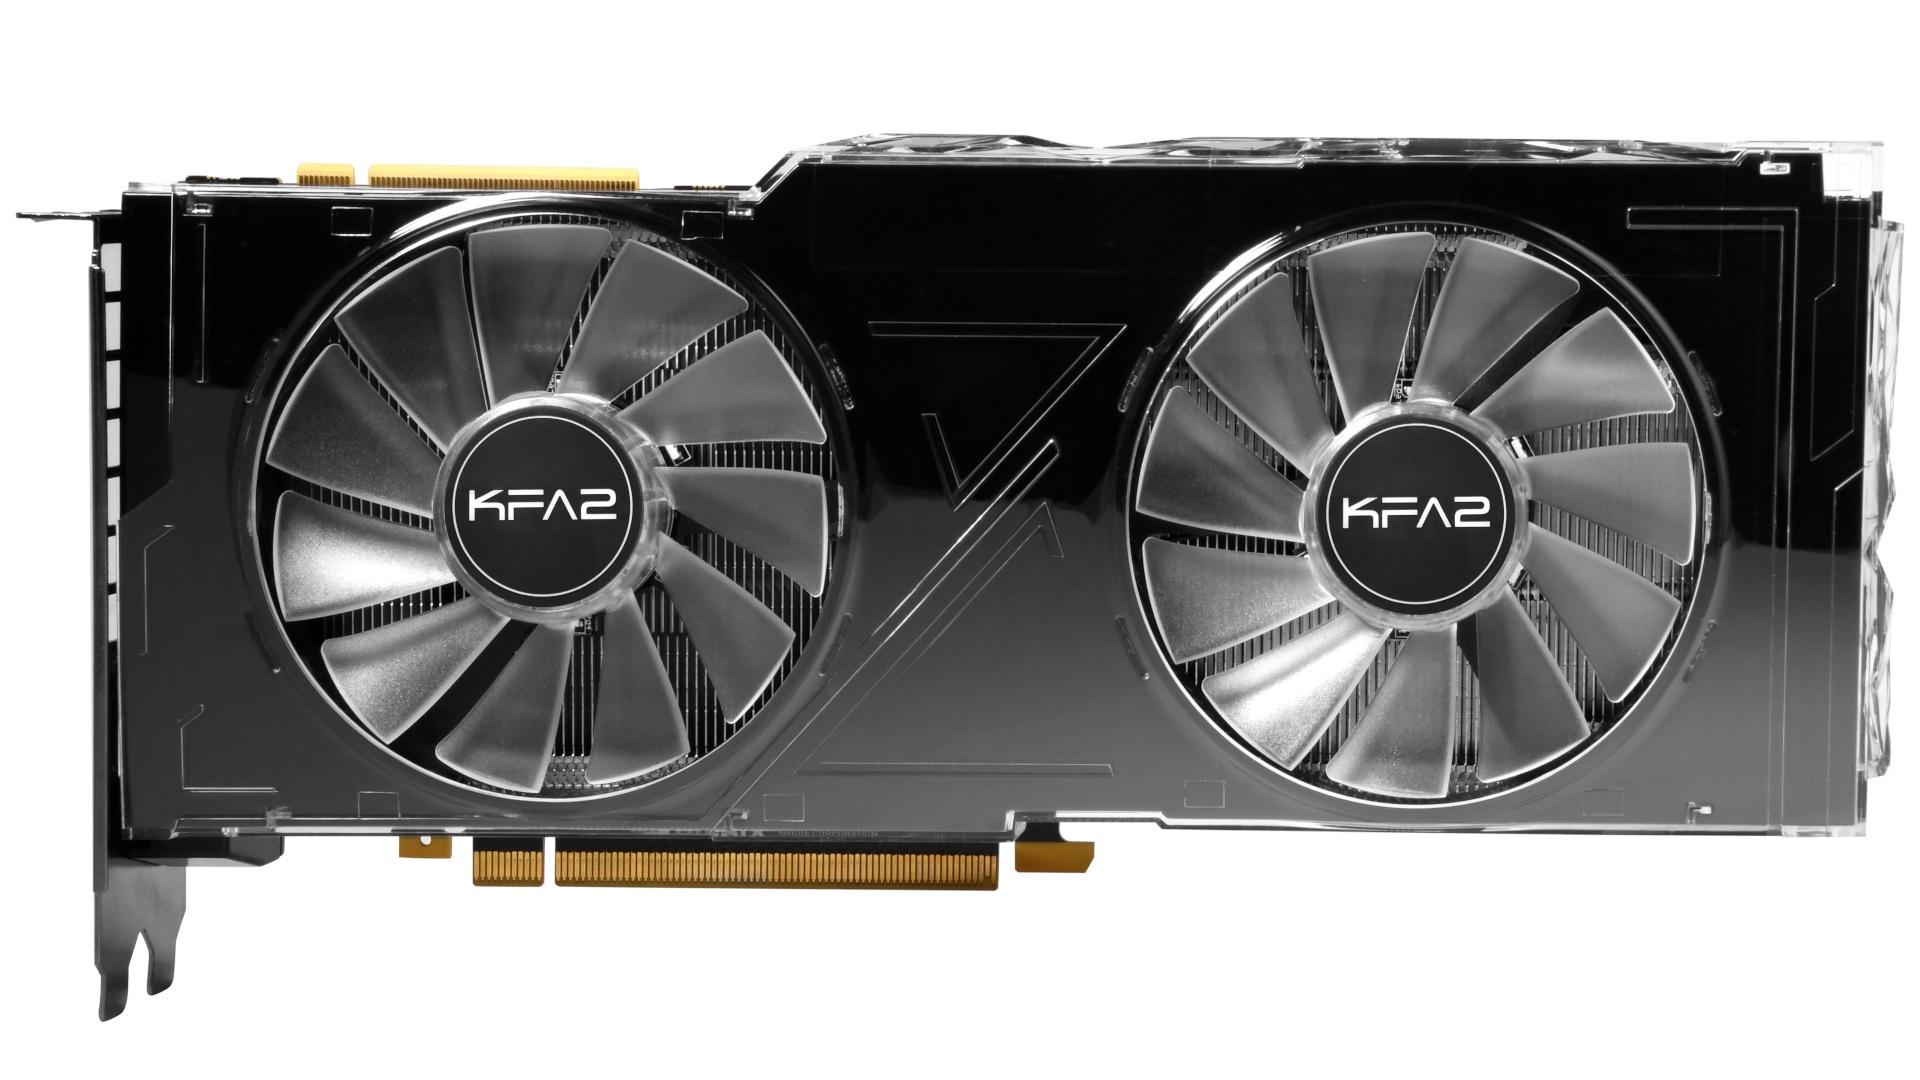 KFA2 Geforce RTX 2080 OC im Test - Preiswertes Turing-Modell